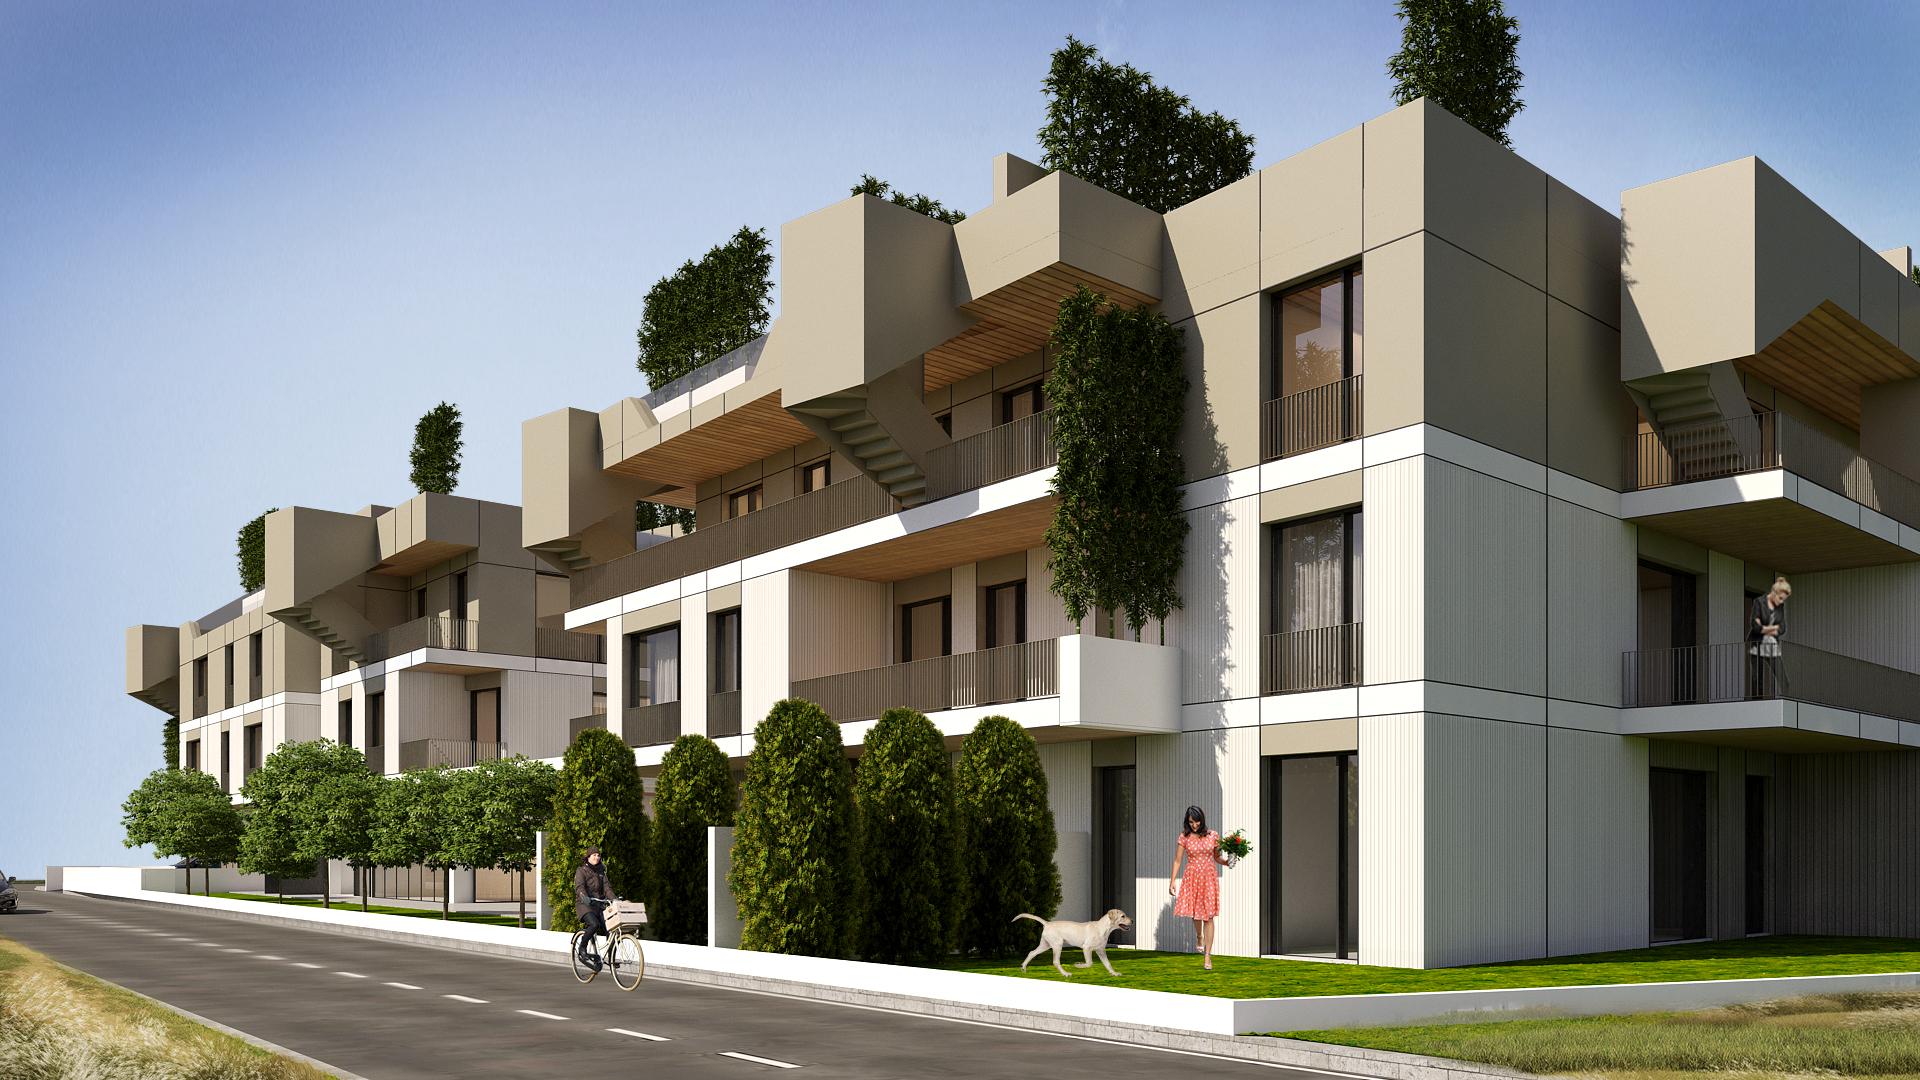 https://nbc-arhitect.ro/wp-content/uploads/2021/09/Coralilor-3.jpg